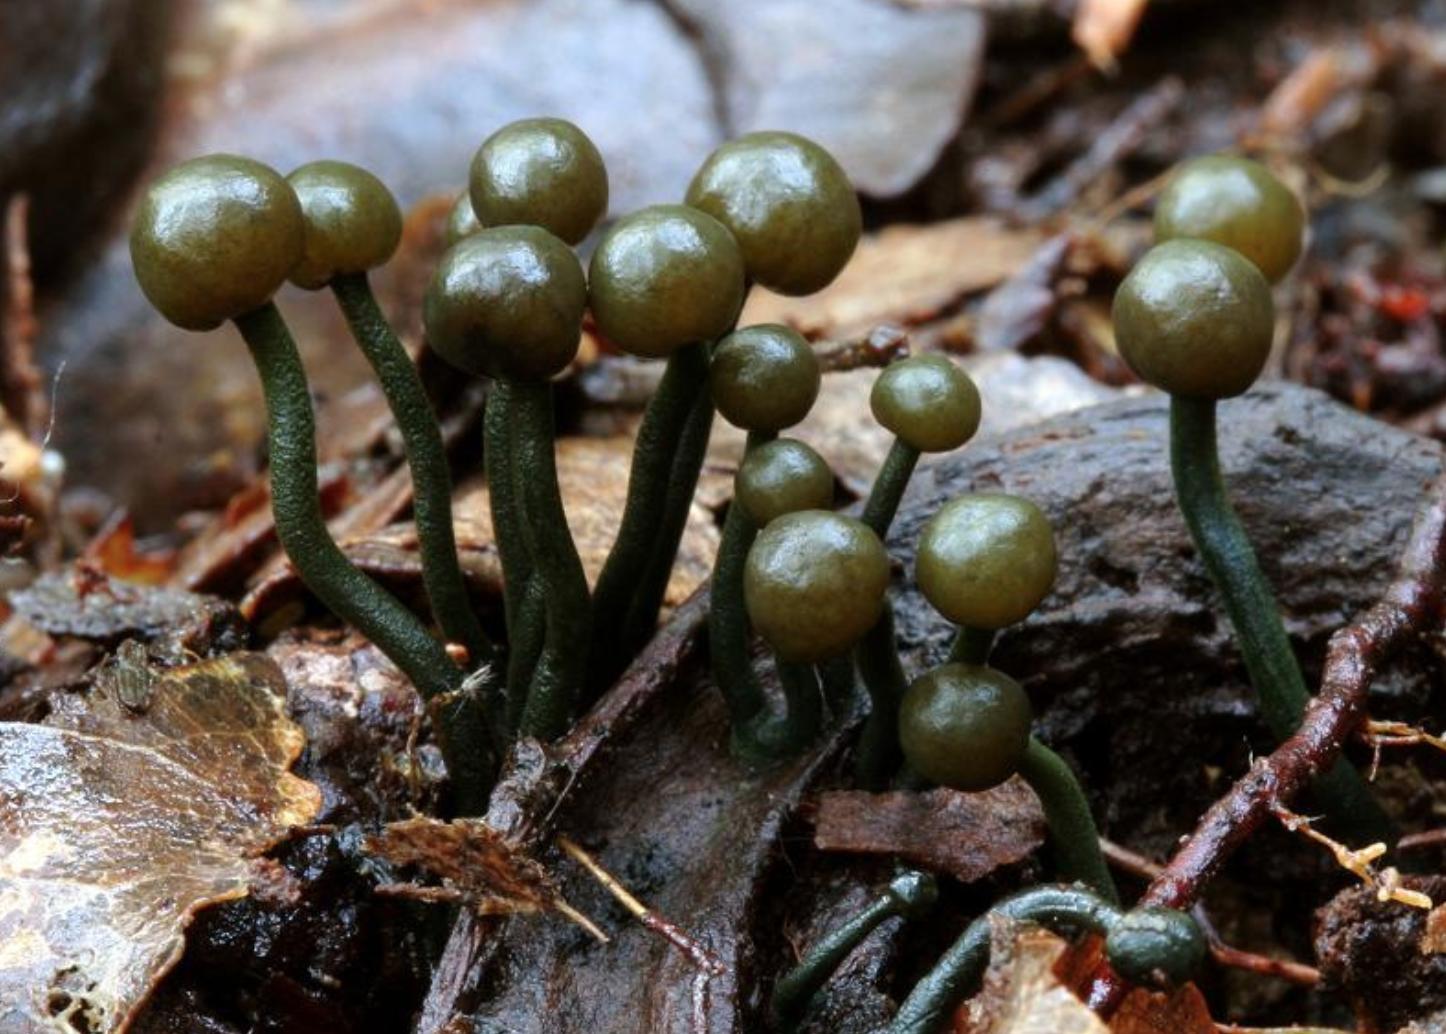 Chlorovibrissea phialophora in NZ. Photo by  Clive .